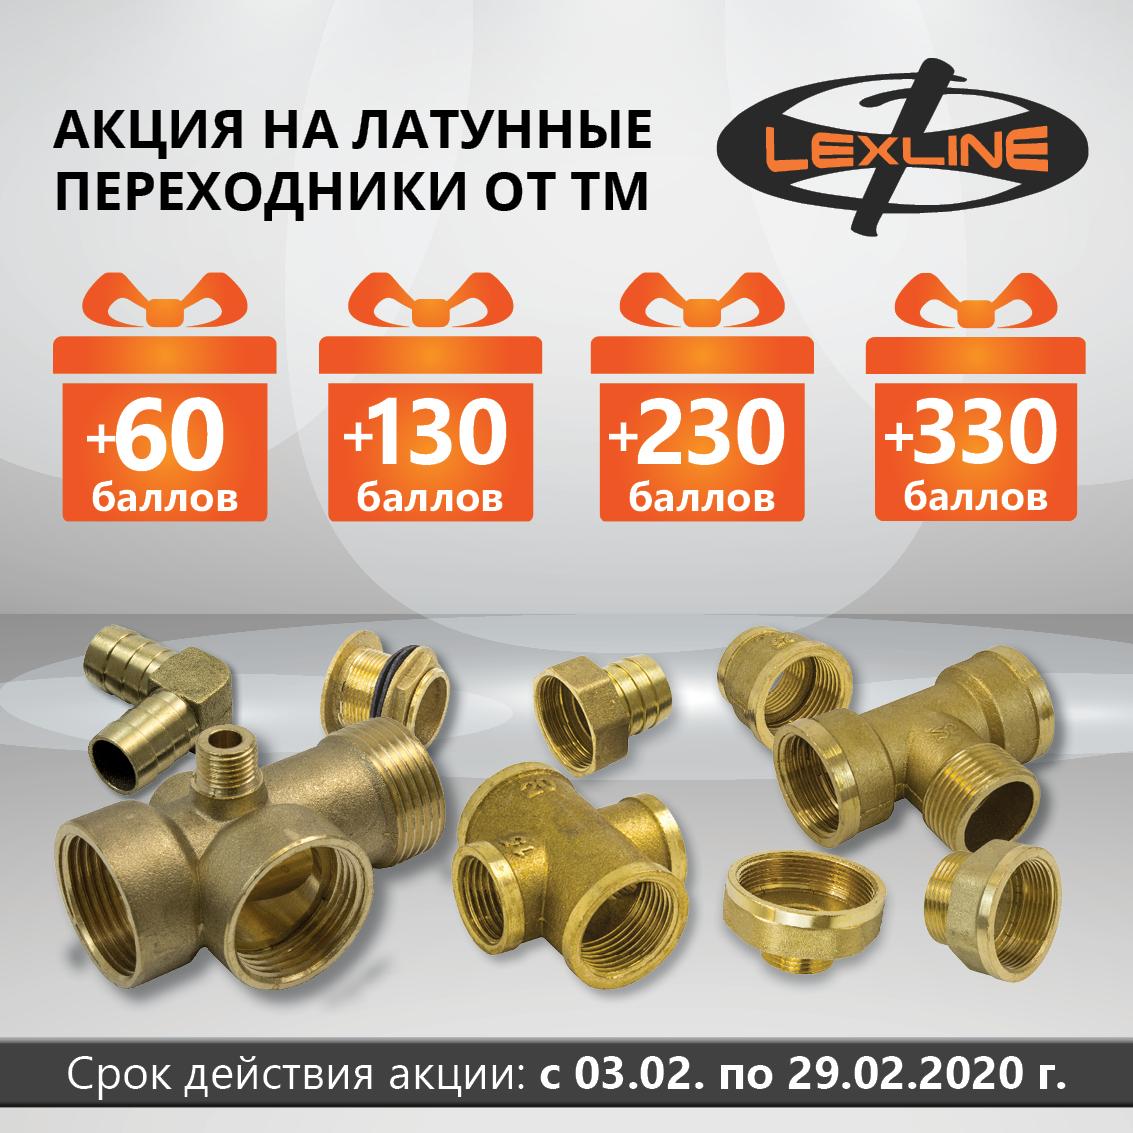 Banner_akciya_perehodniki_latunnie_LEXLINE_site_850x850px